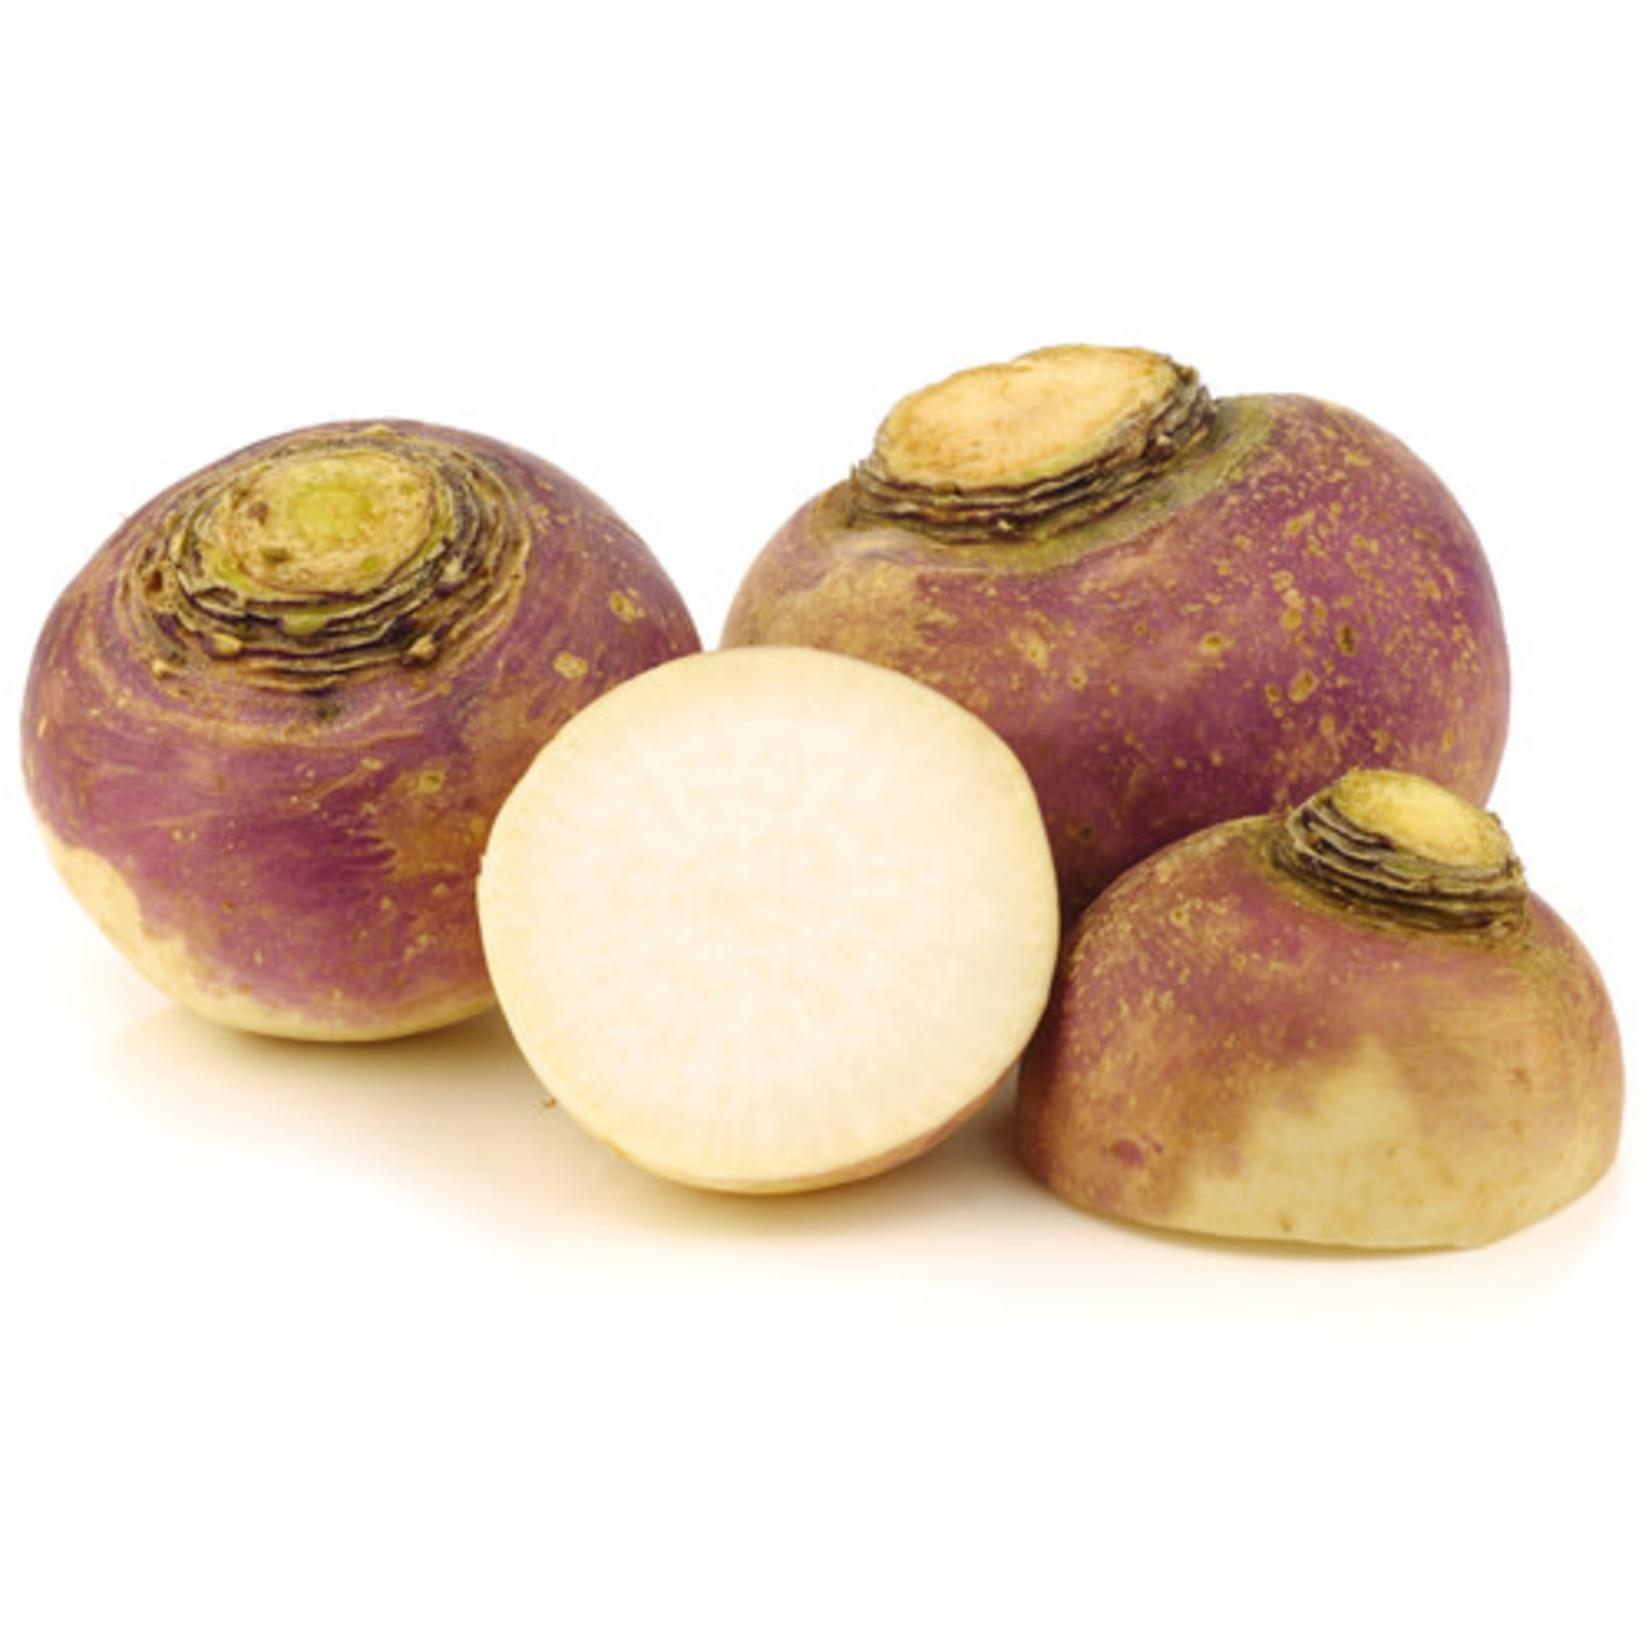 Rutabaga (seed pkg) - OSC Laurentian